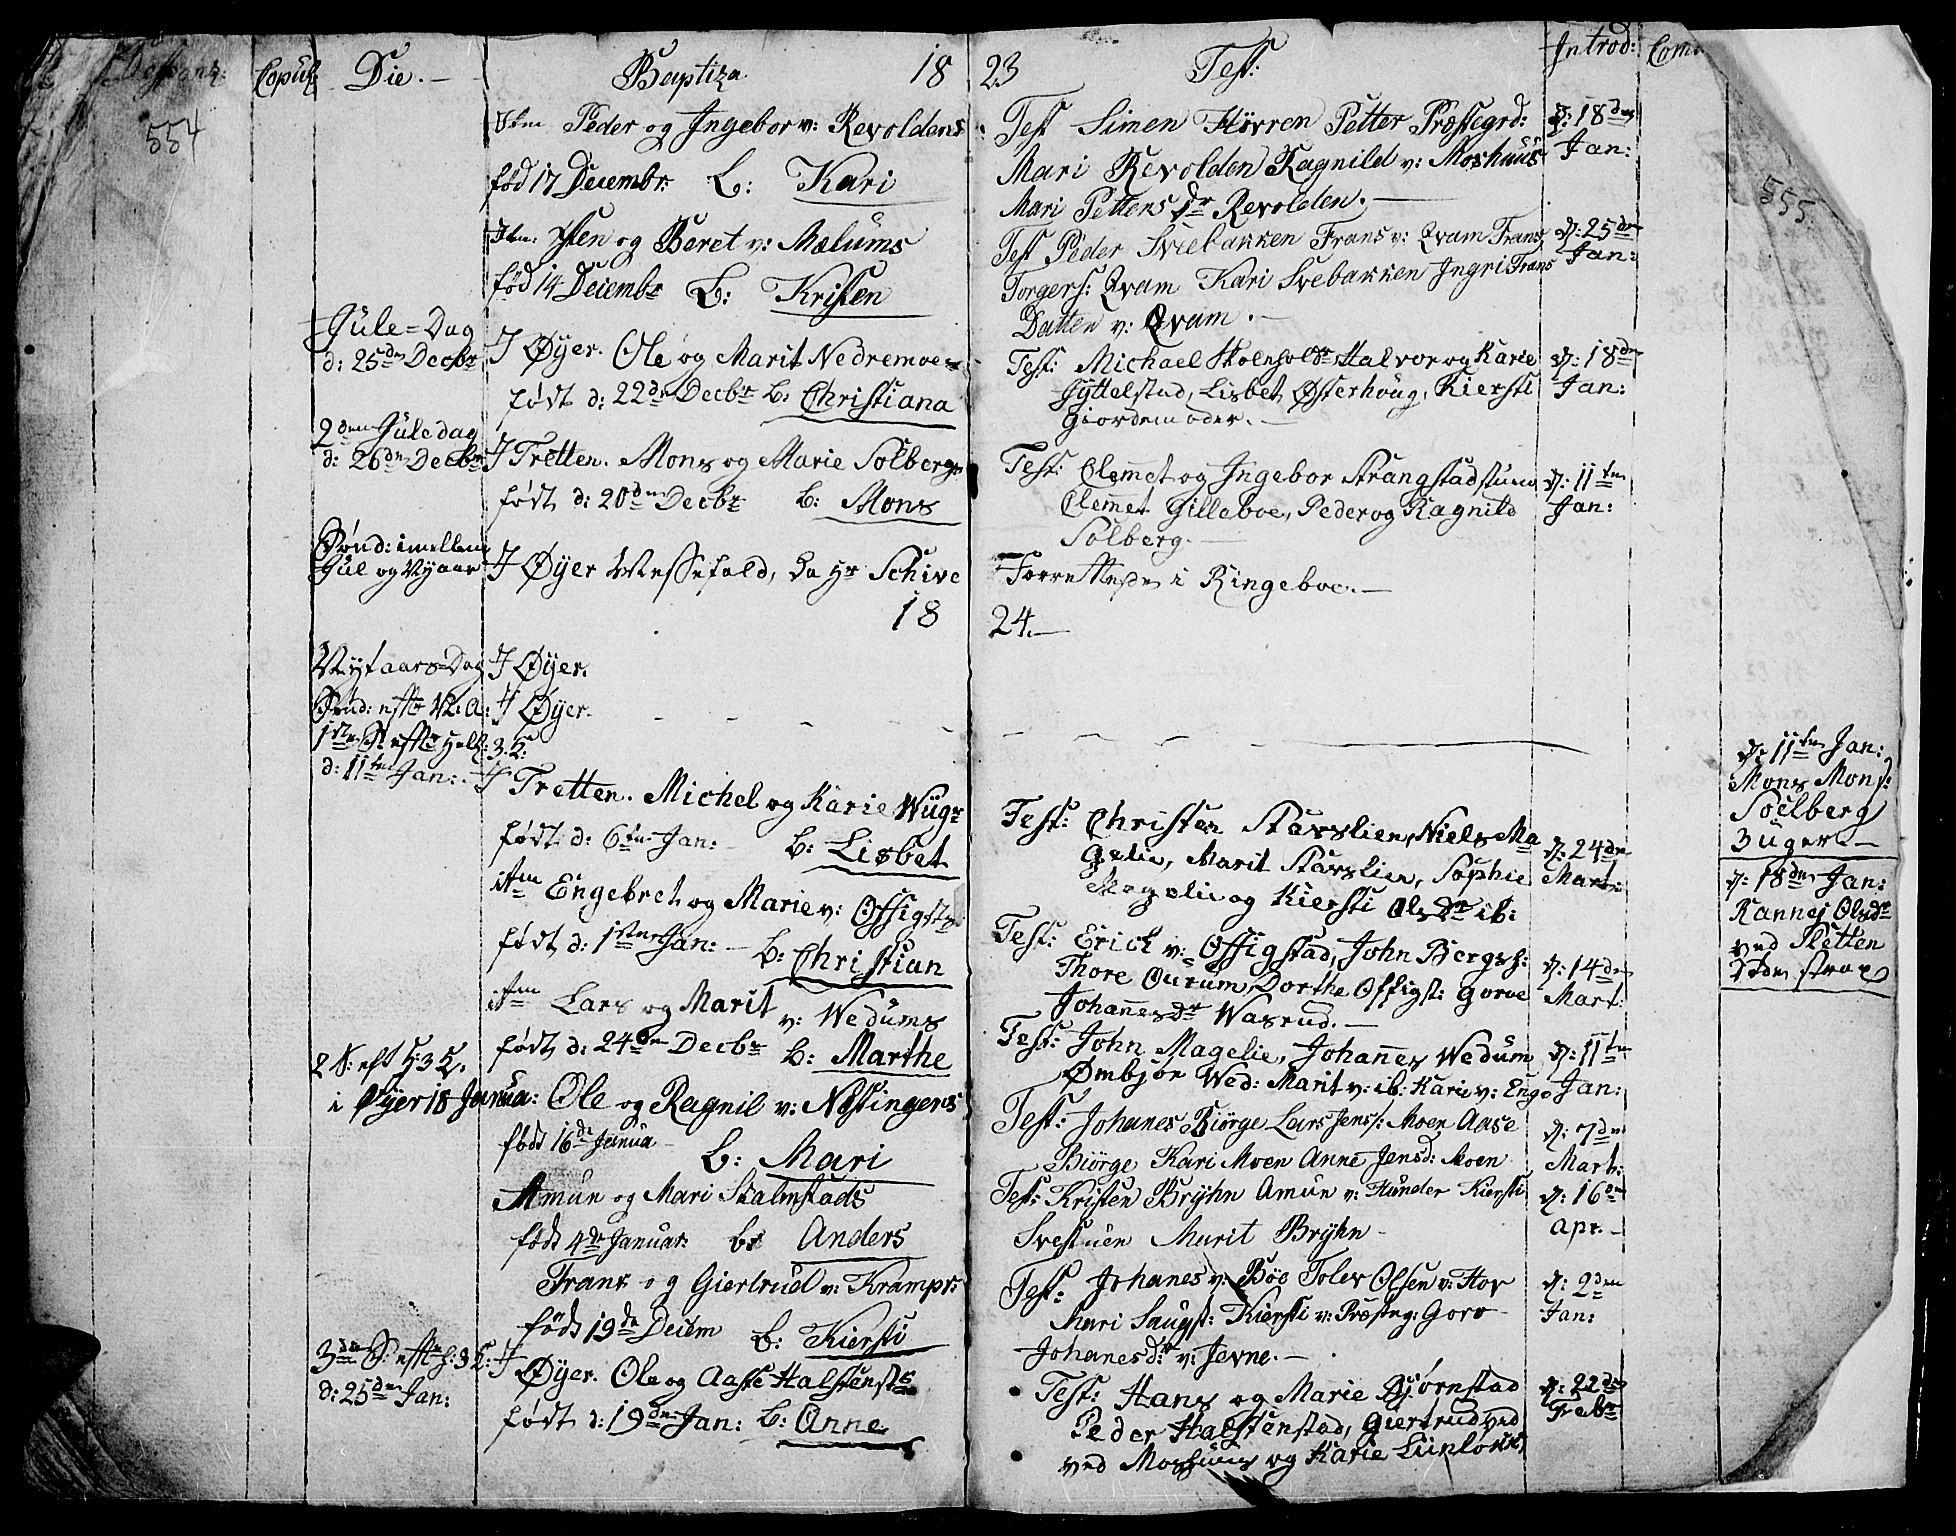 SAH, Øyer prestekontor, Ministerialbok nr. 3, 1784-1824, s. 554-555